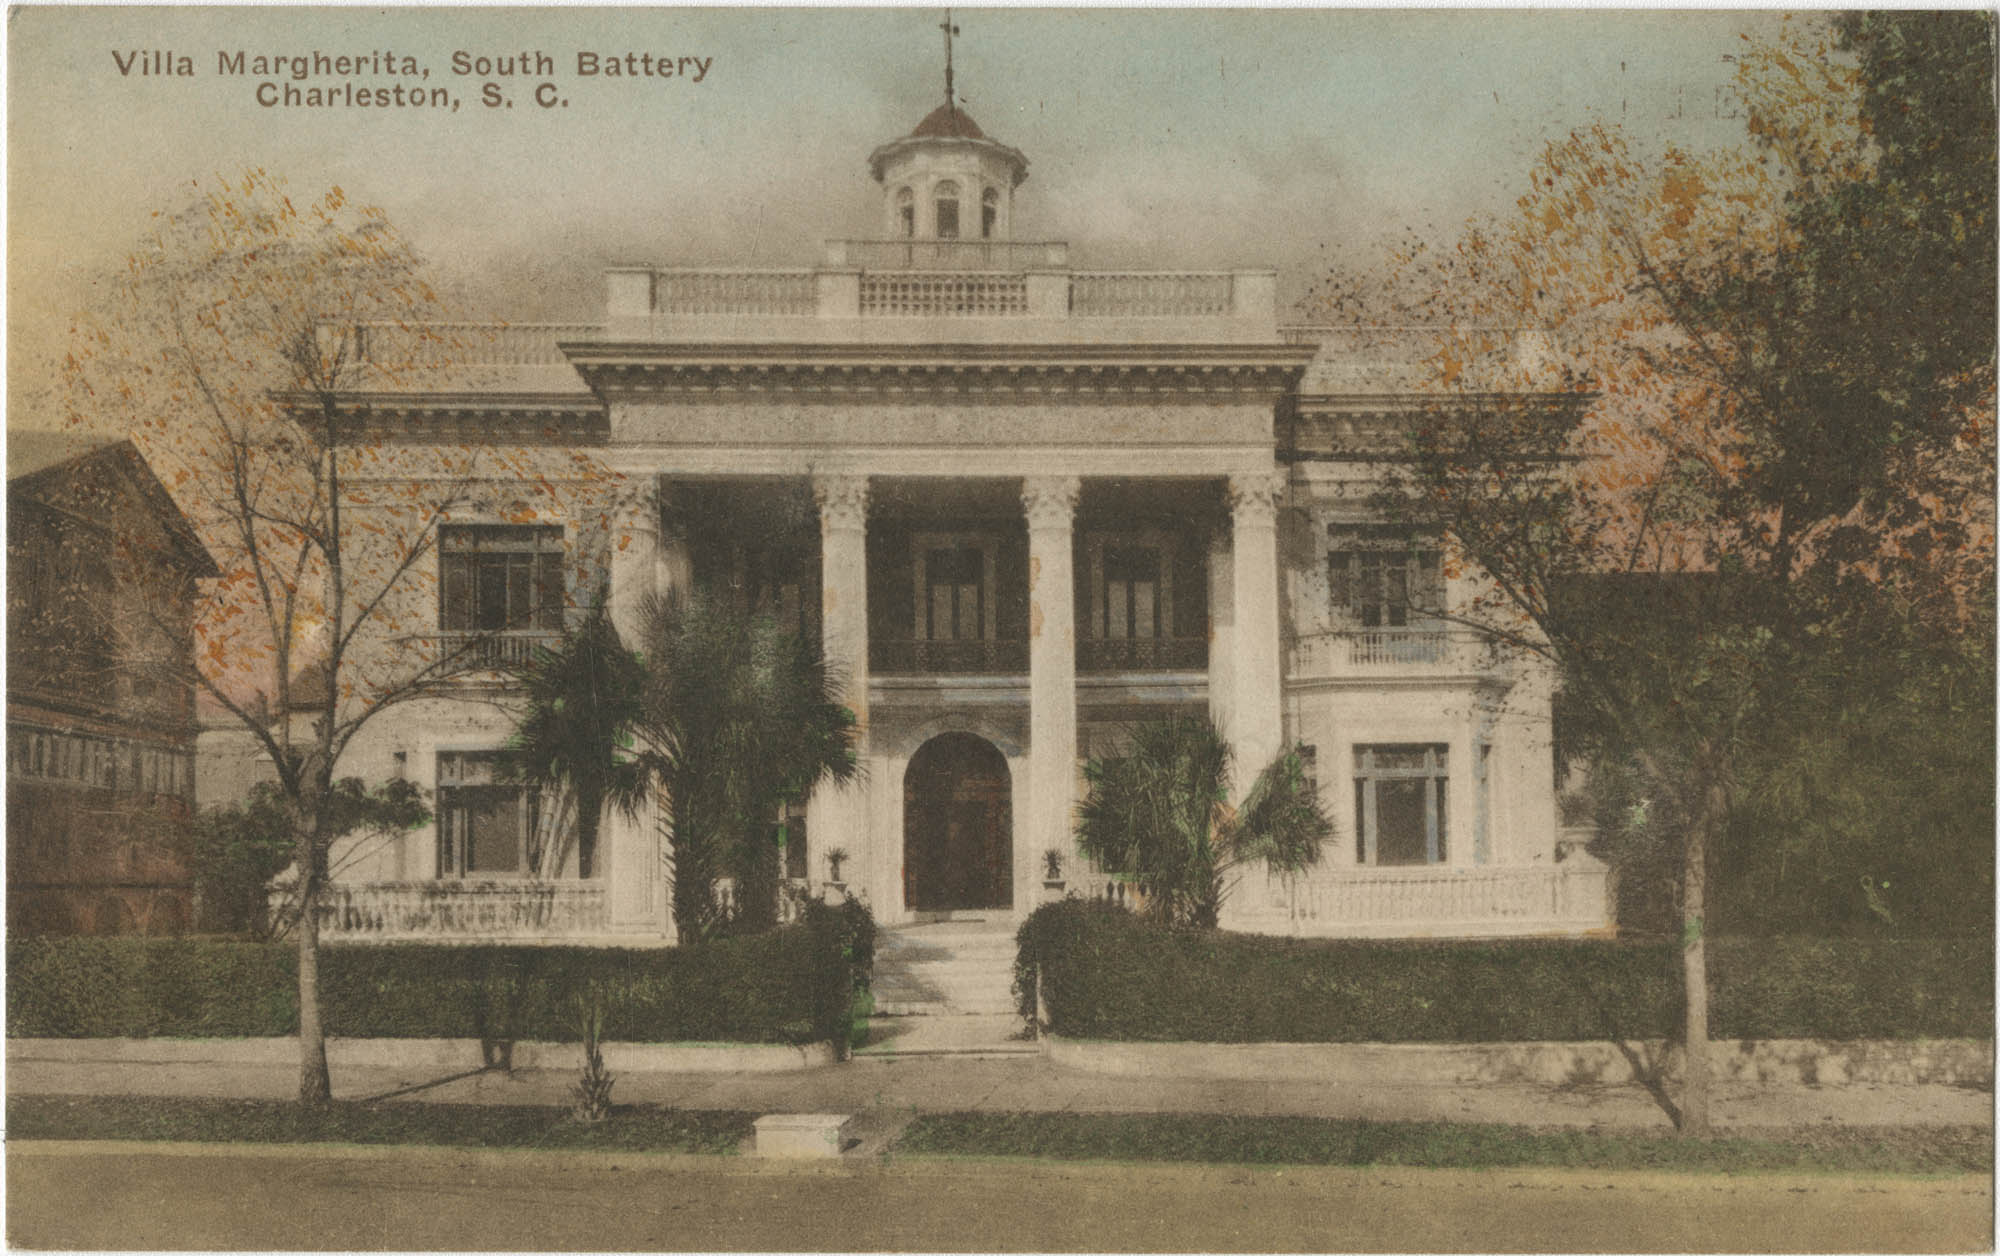 Villa Margherita, South Battery Charleston, S.C.